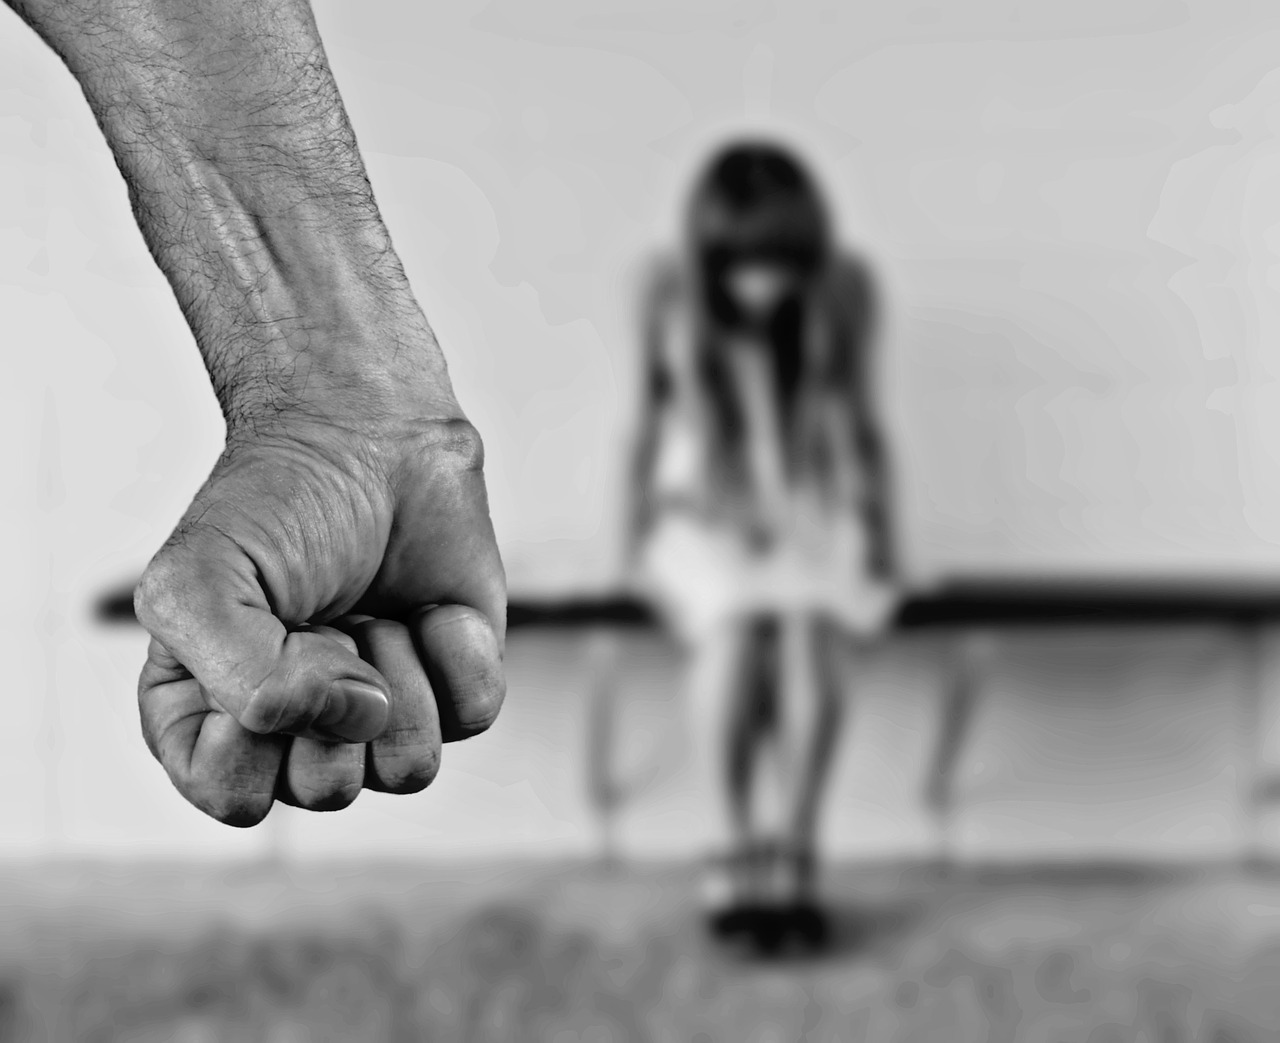 В Таганроге мужчина до смерти забил сожительницу